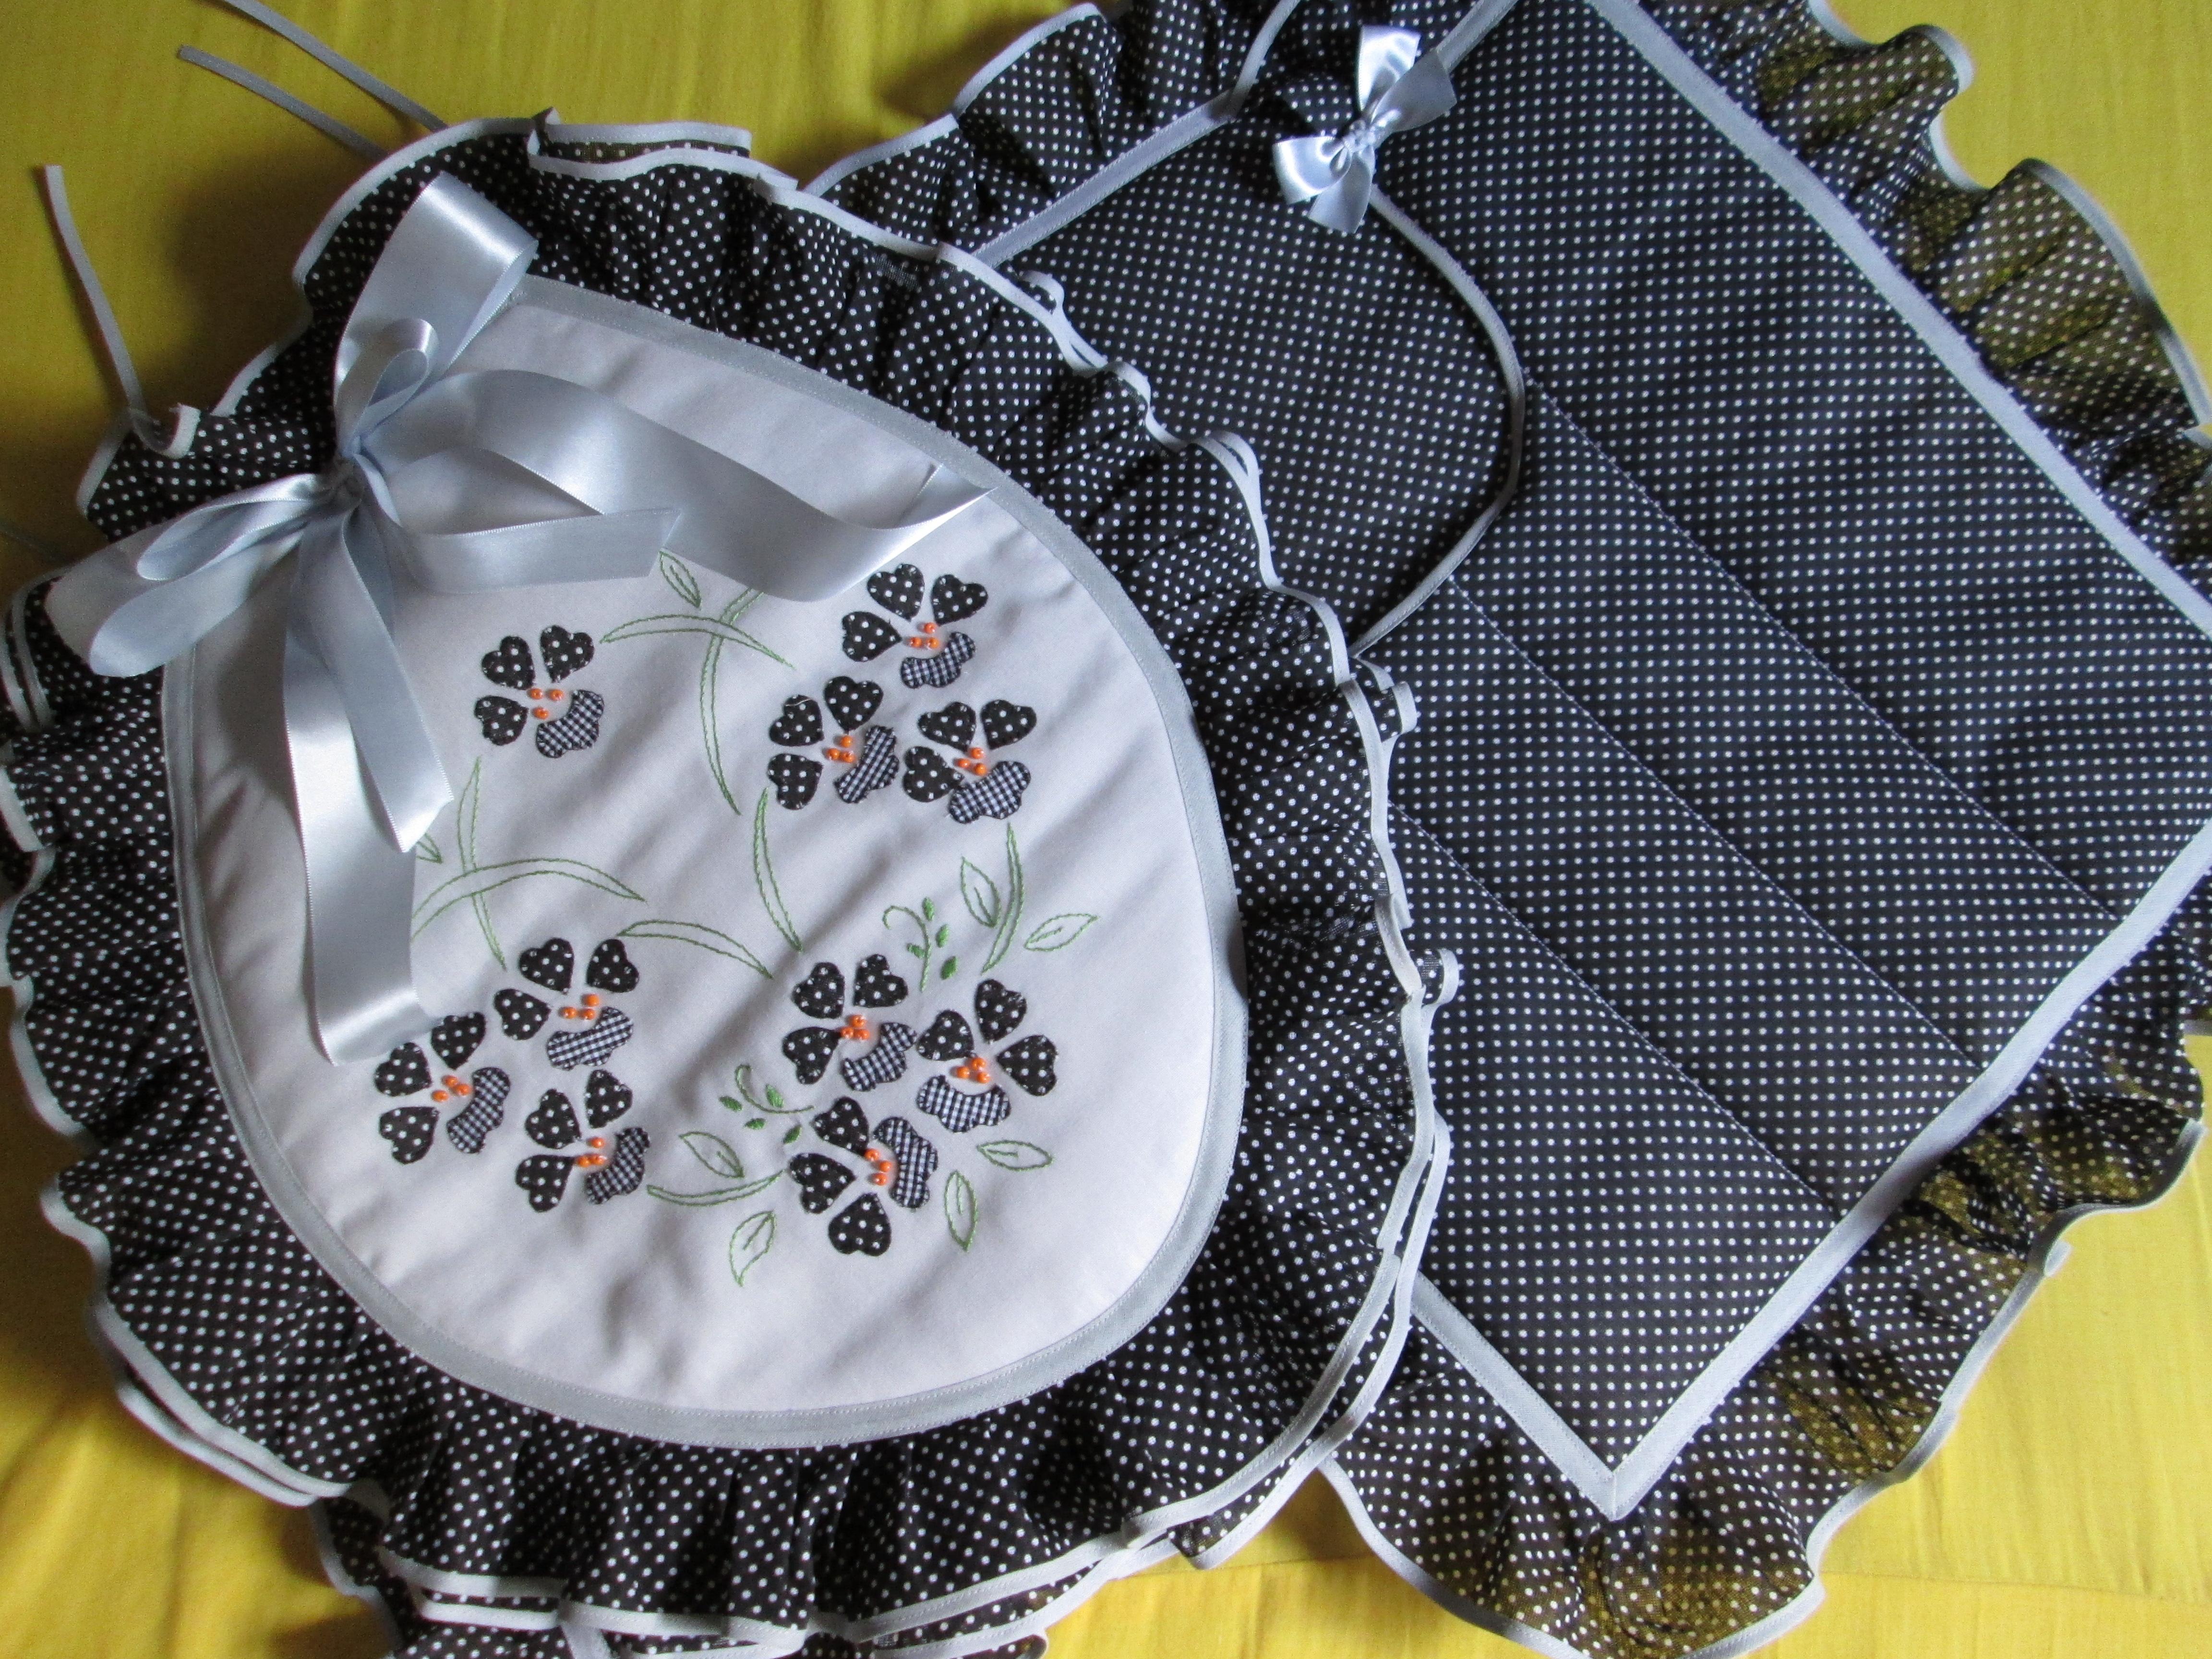 kit banheiro preto e cinza decoracao banheiro kit banheiro preto #A79A24 4608x3456 Banheiro Branco Preto E Cinza